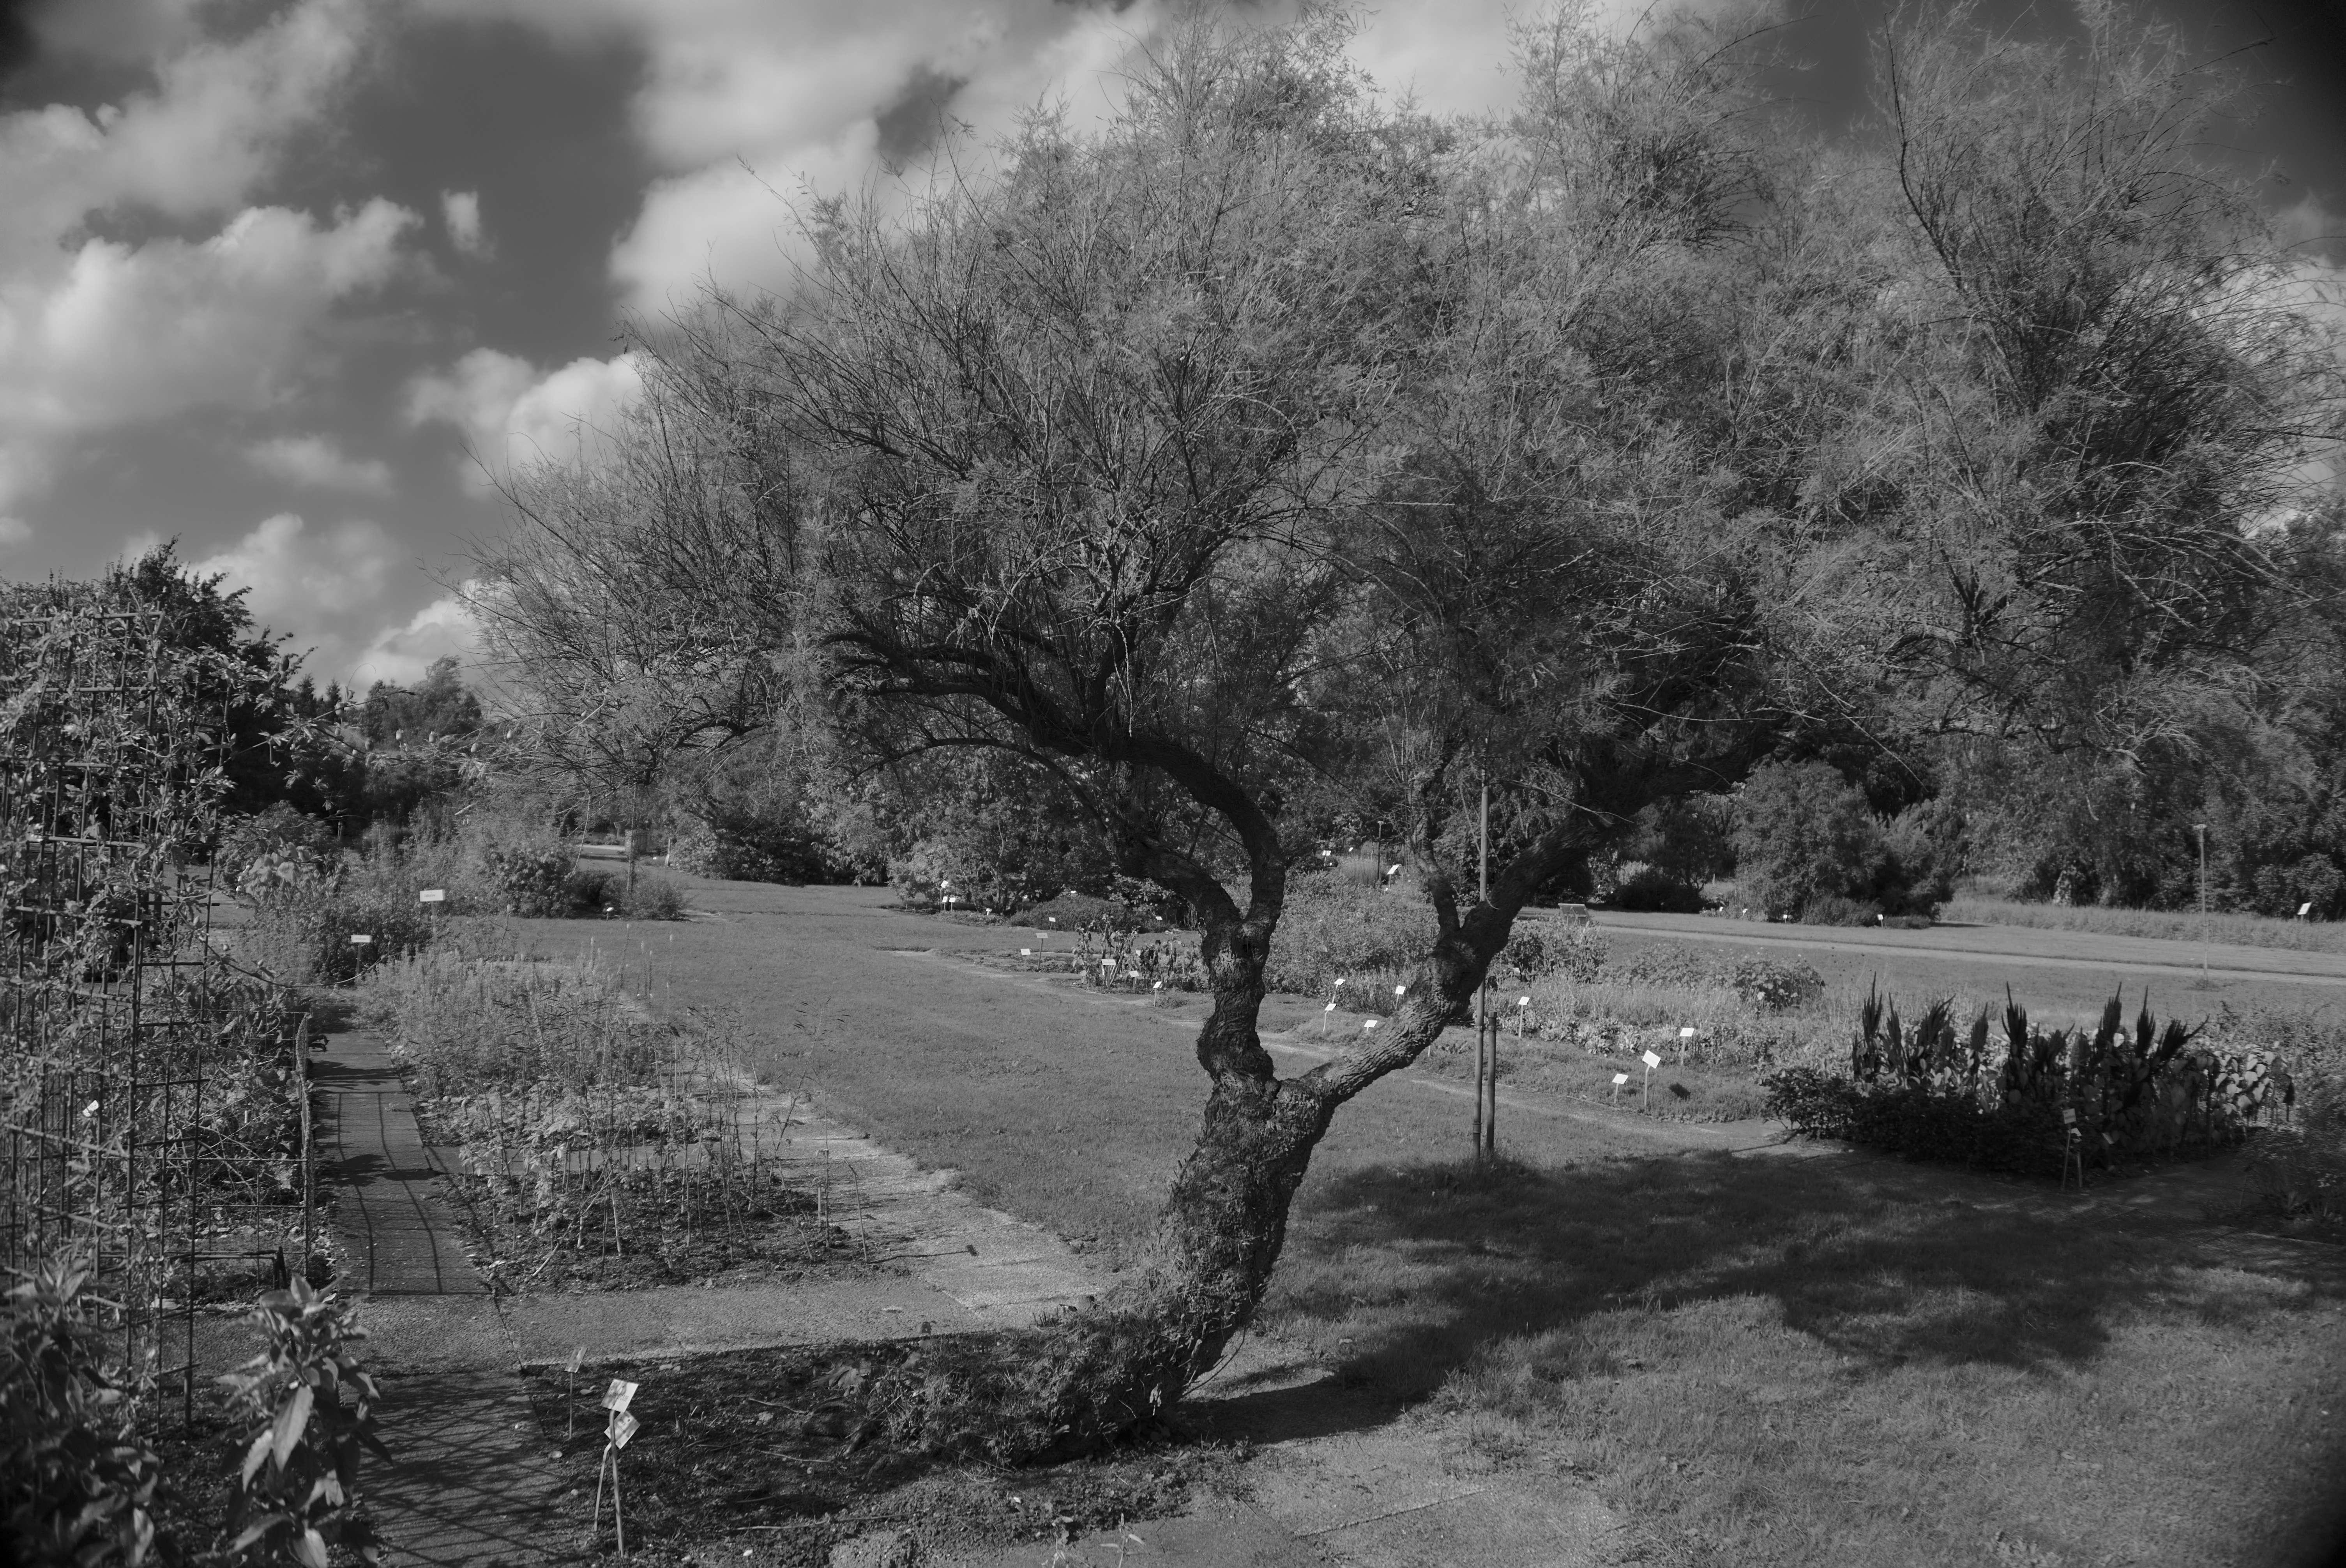 Tree in Botanical Garden